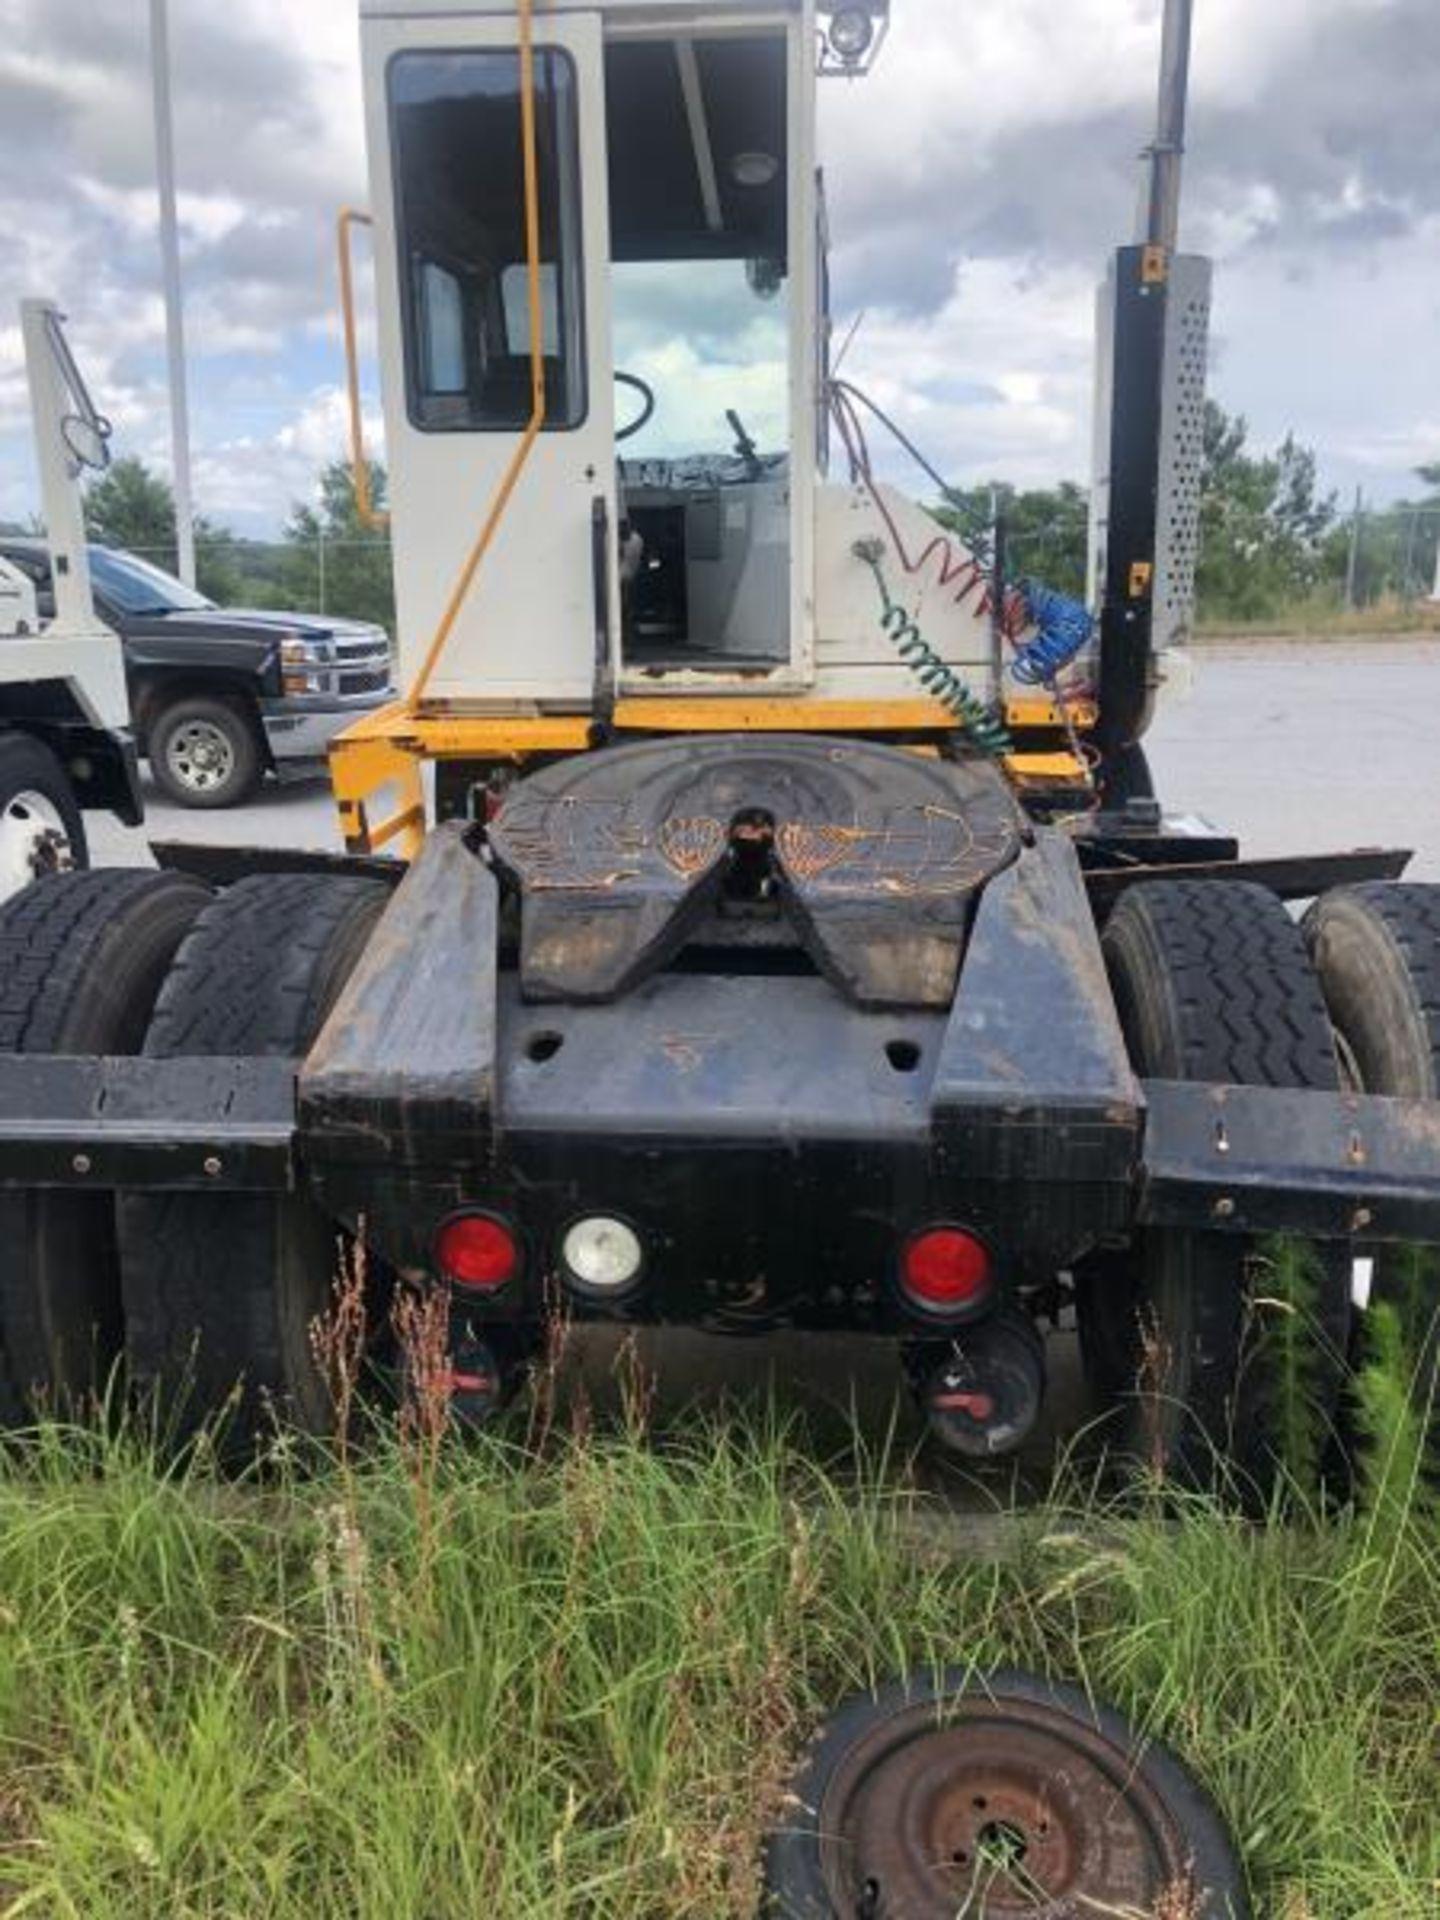 2015 Kalmar Ottawa 4x2 Yard Truck , SN: 338845 2,600.5 Hours, 185 Miles - Image 9 of 27